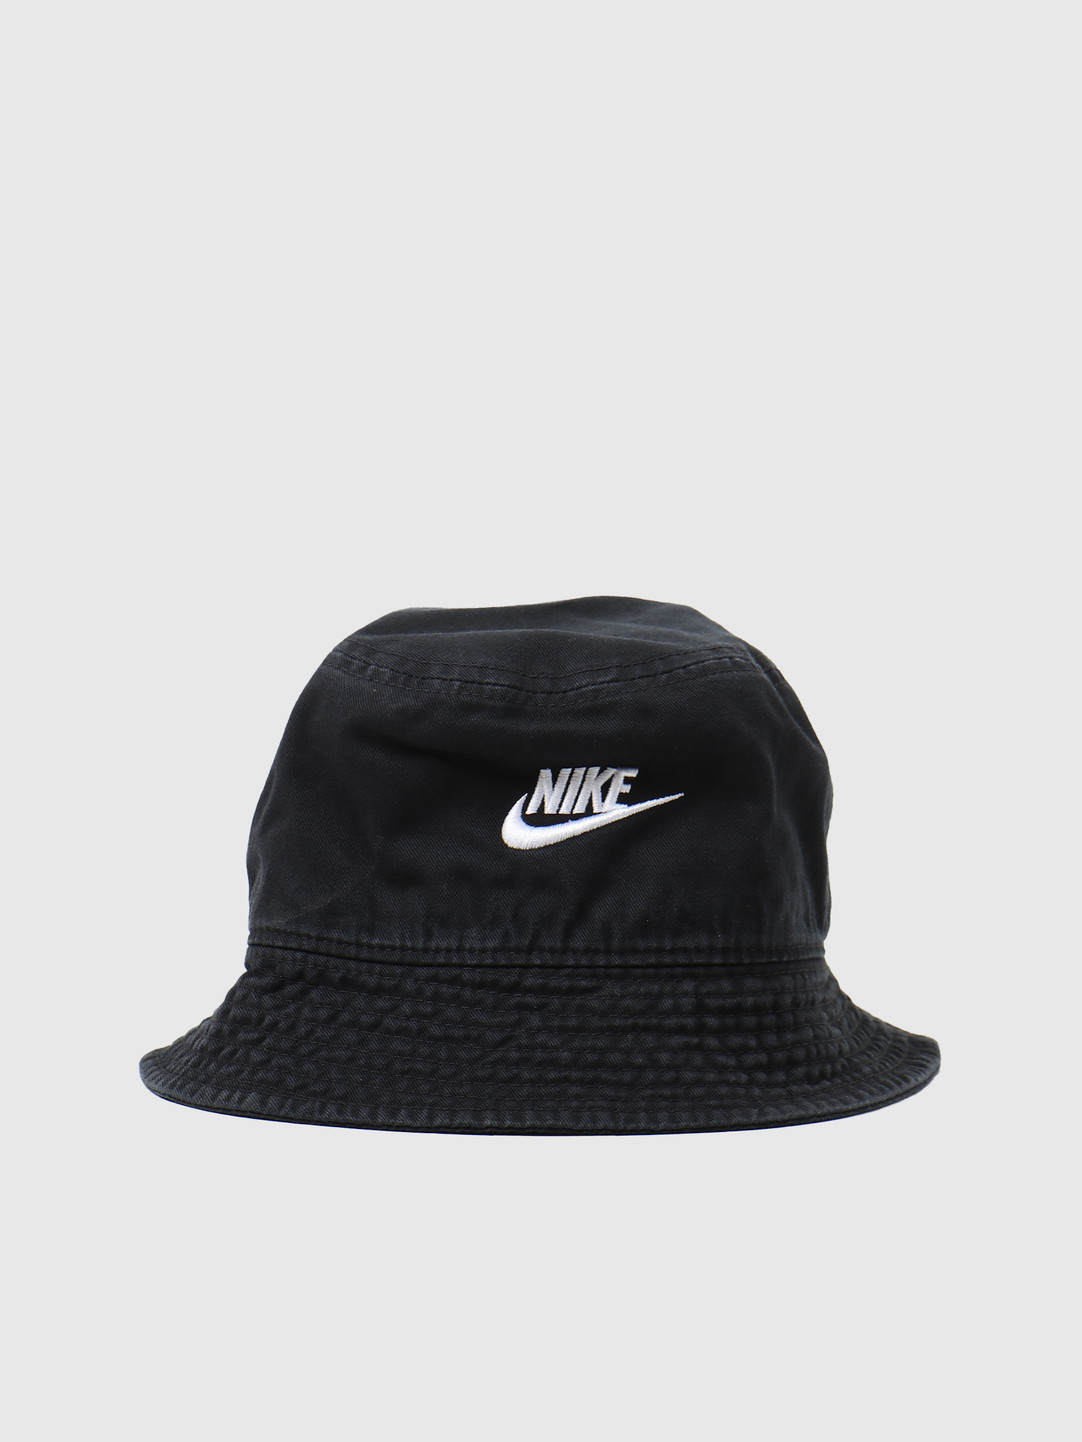 Nike Nike NSW Bucket Hat Futura Wash Black White DC3967-010